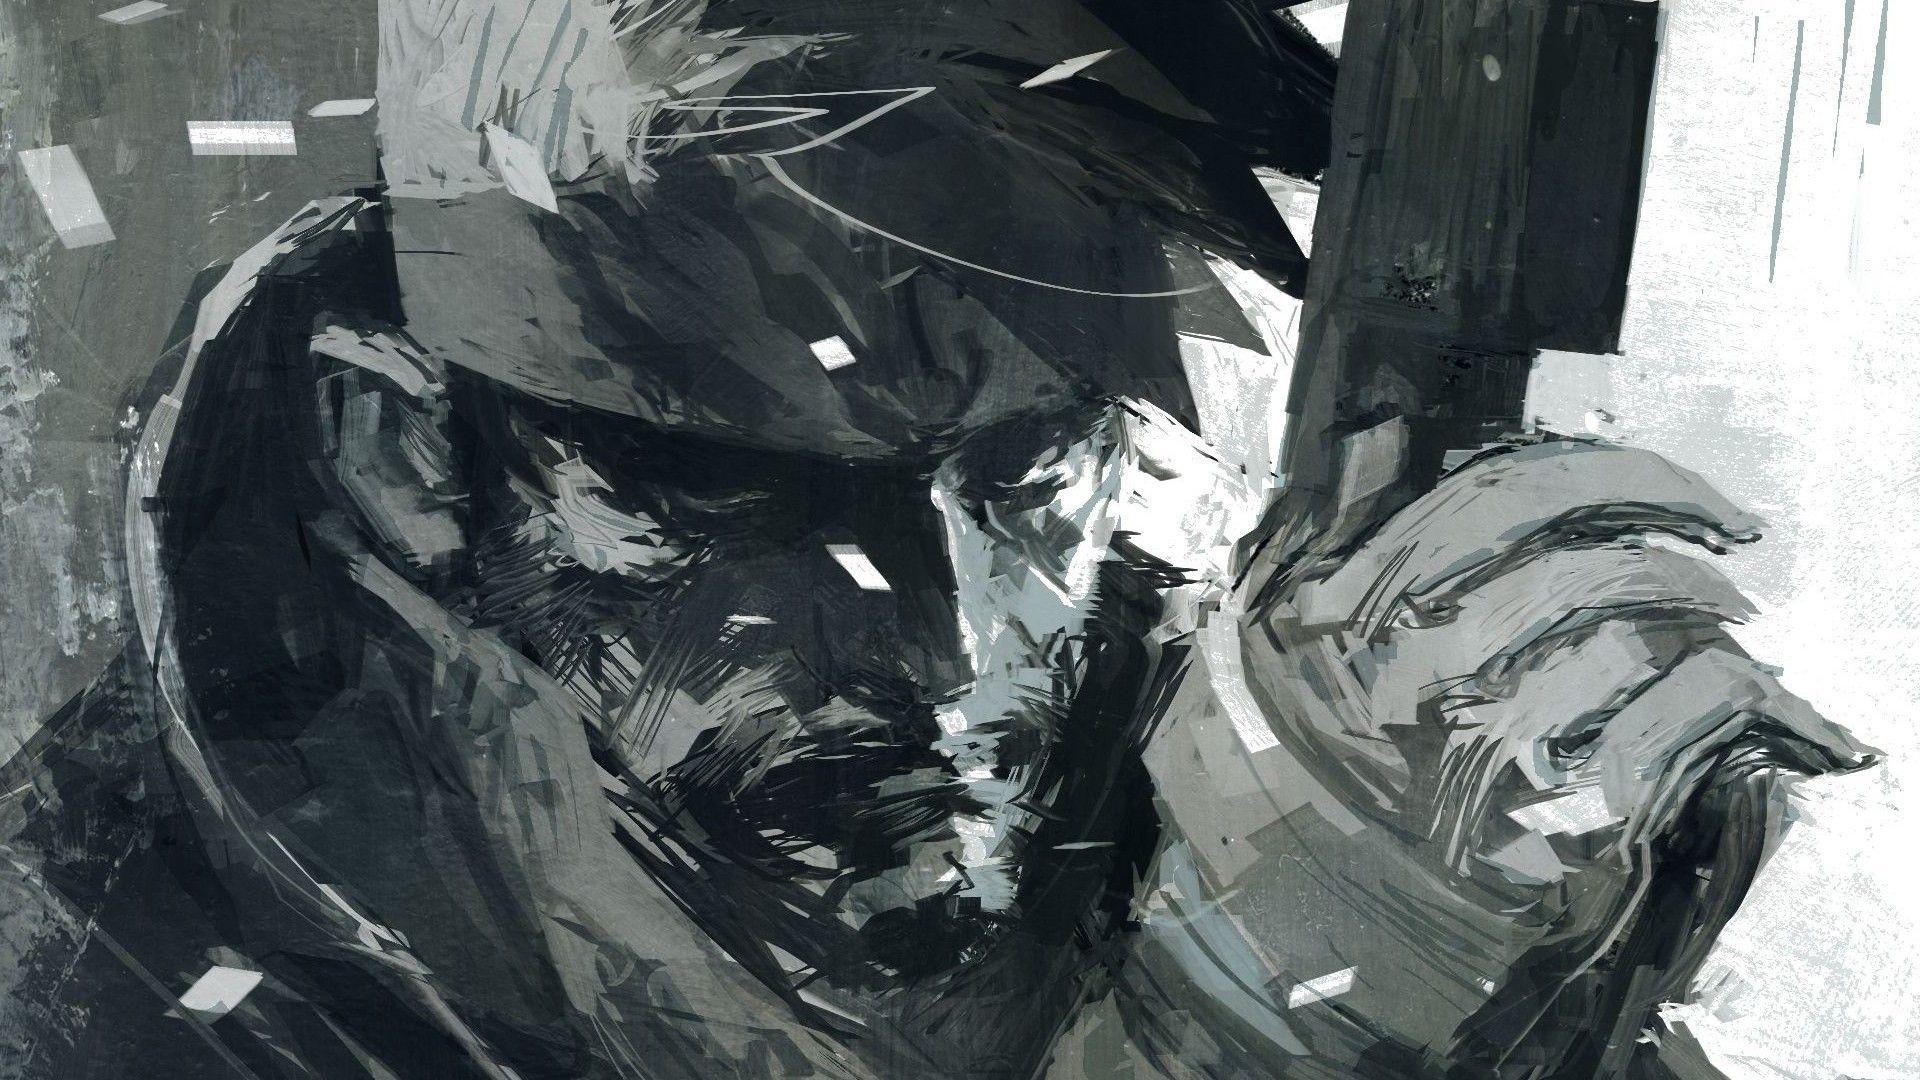 Metal Gear Solid HD Sublime Wallpaper Free HD Wallpaper – Download .